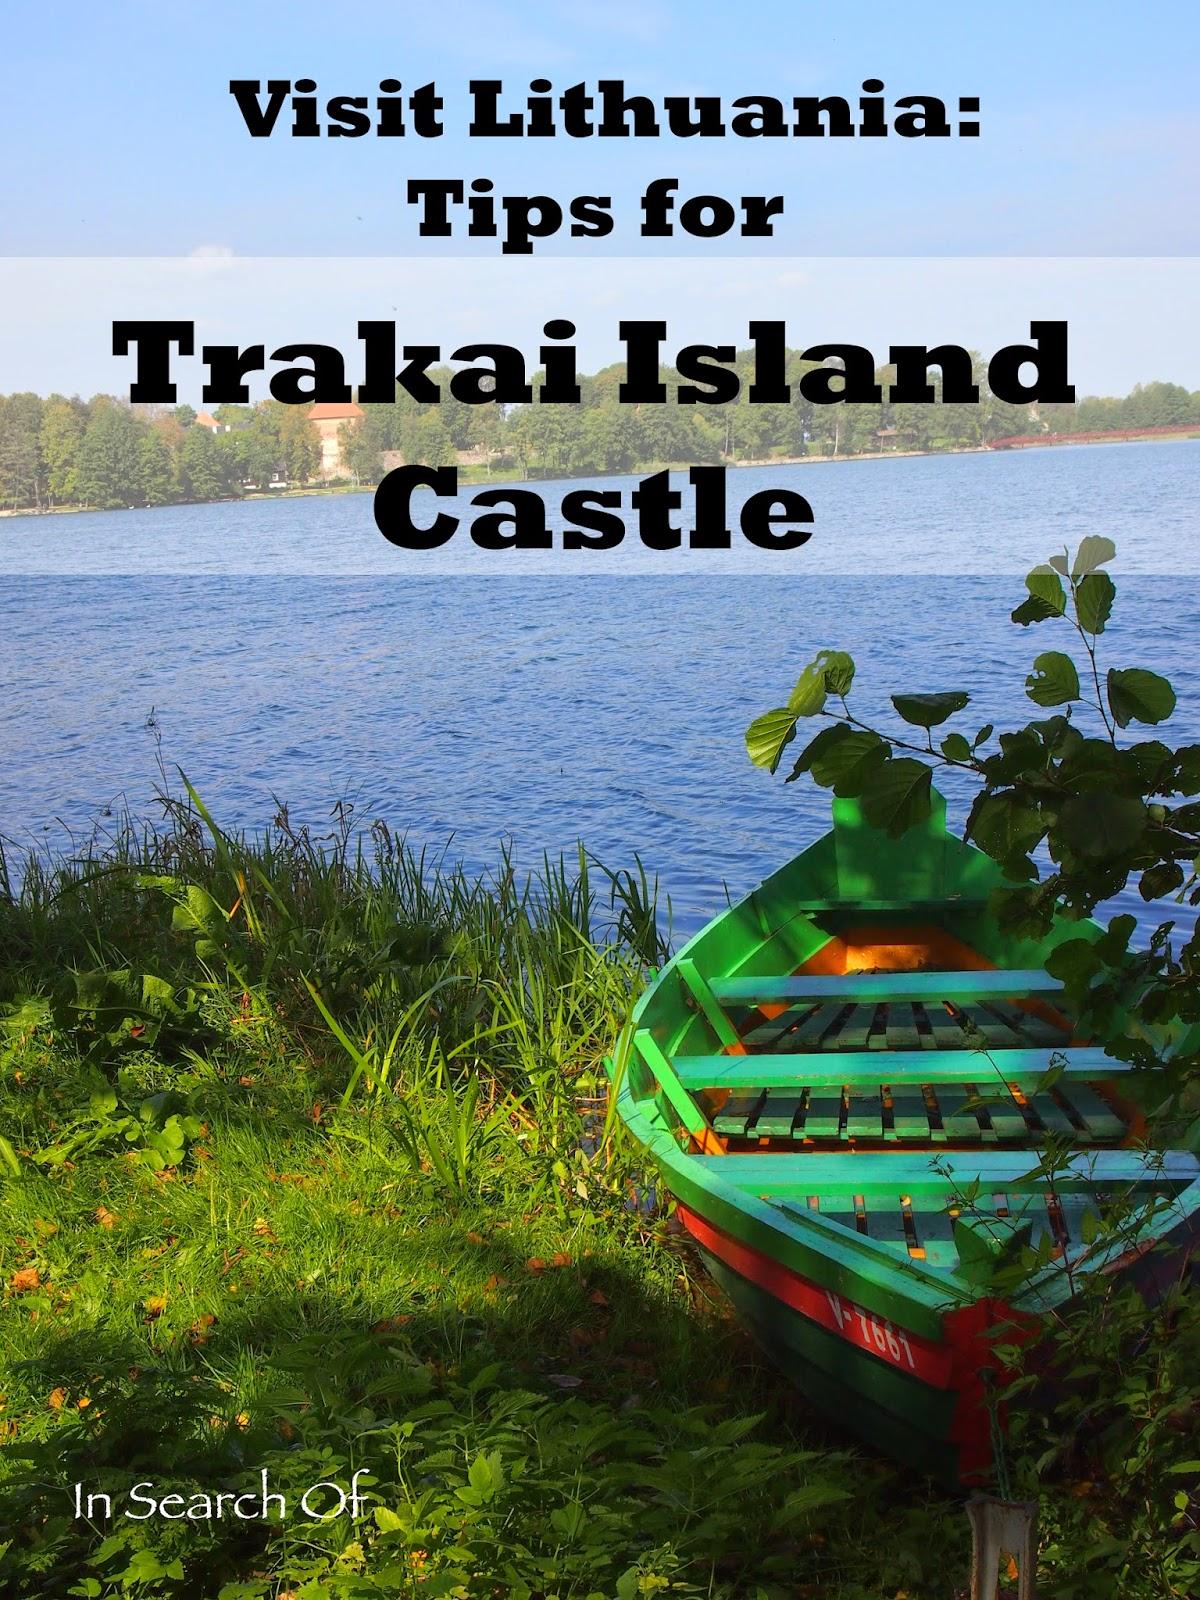 A colorful boat in Trakai Island Castle